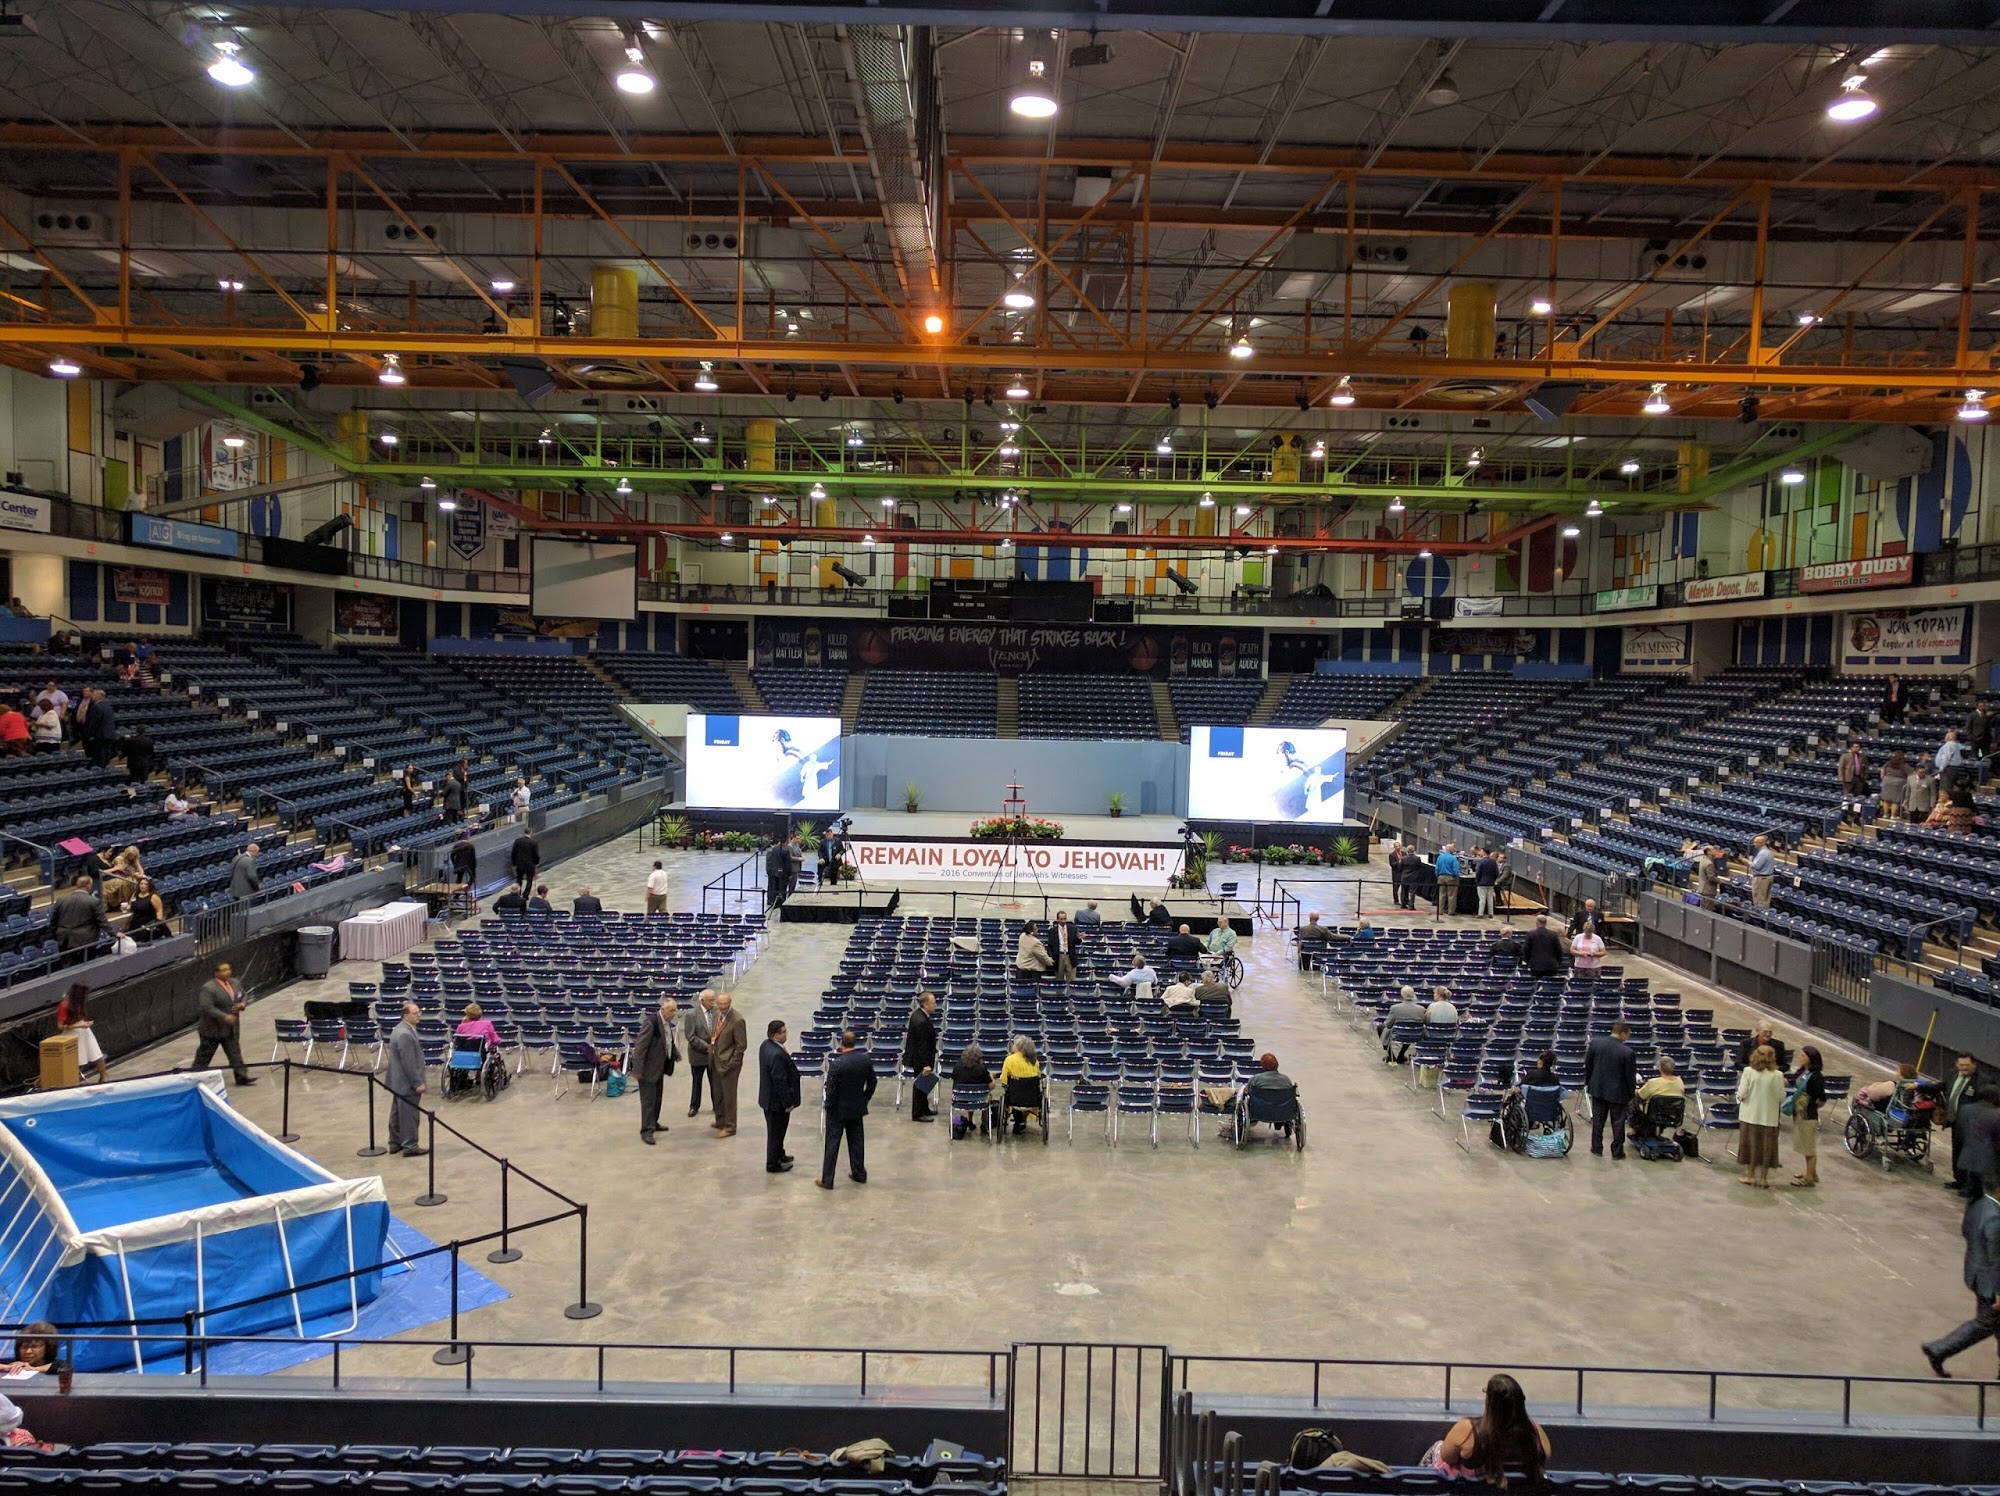 Amarillo Civic Center Complex 401 S Buchanan St, Amarillo